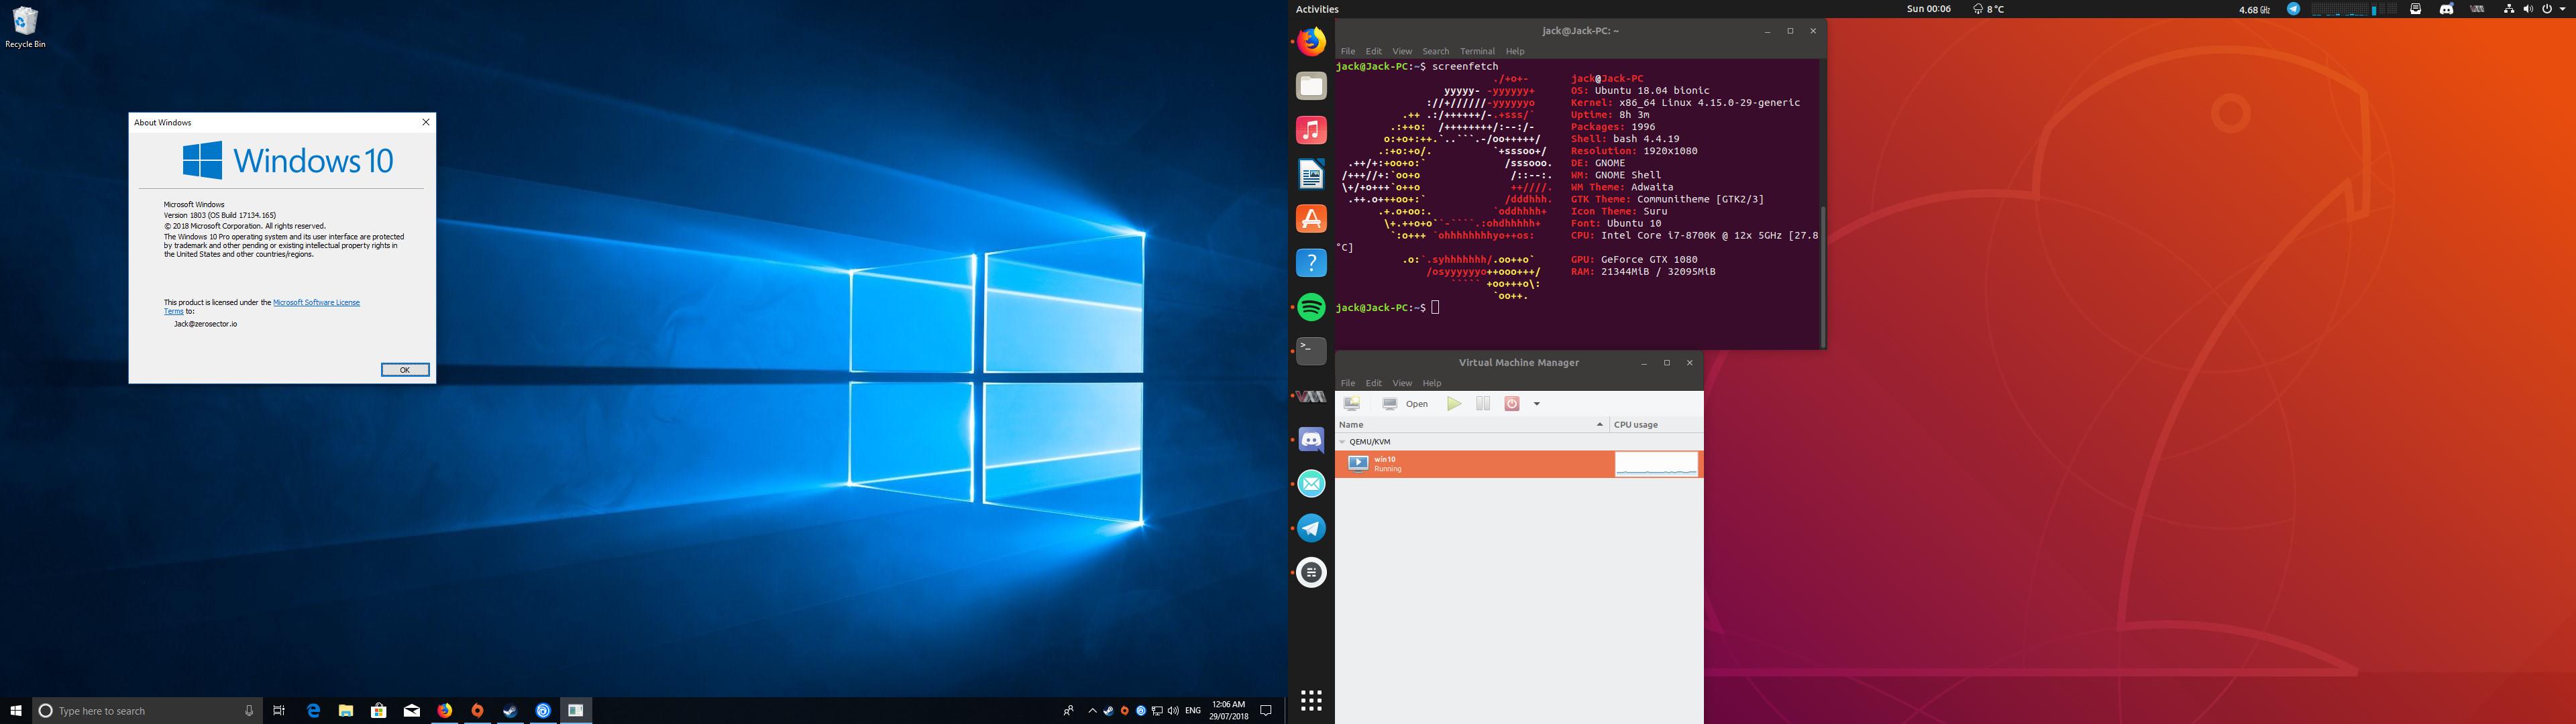 Permission denied as root for vfio-pci conf Ubuntu server 18 04